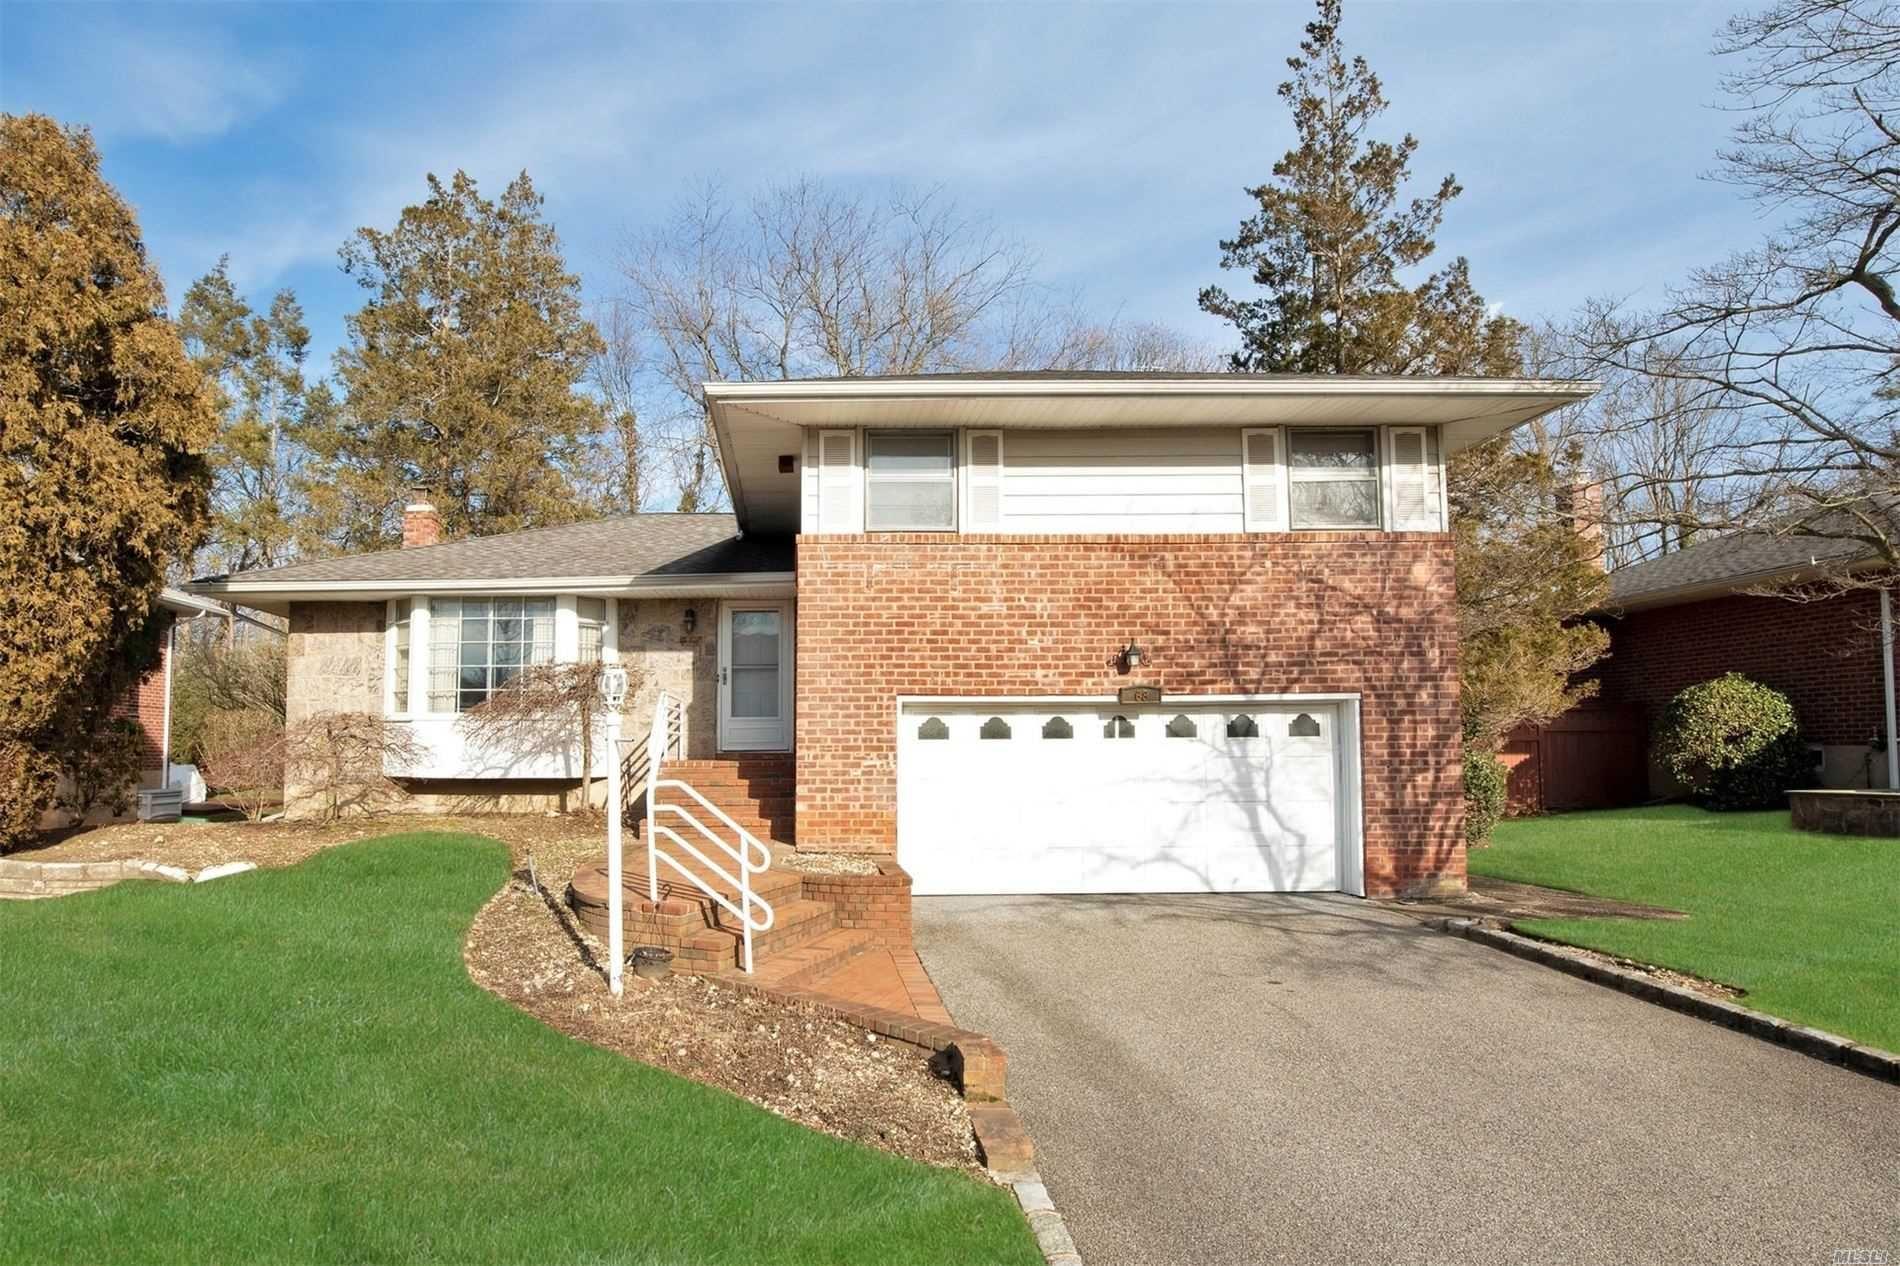 68 Winthrop Road, Plainview, NY 11803 - MLS#: 3199780